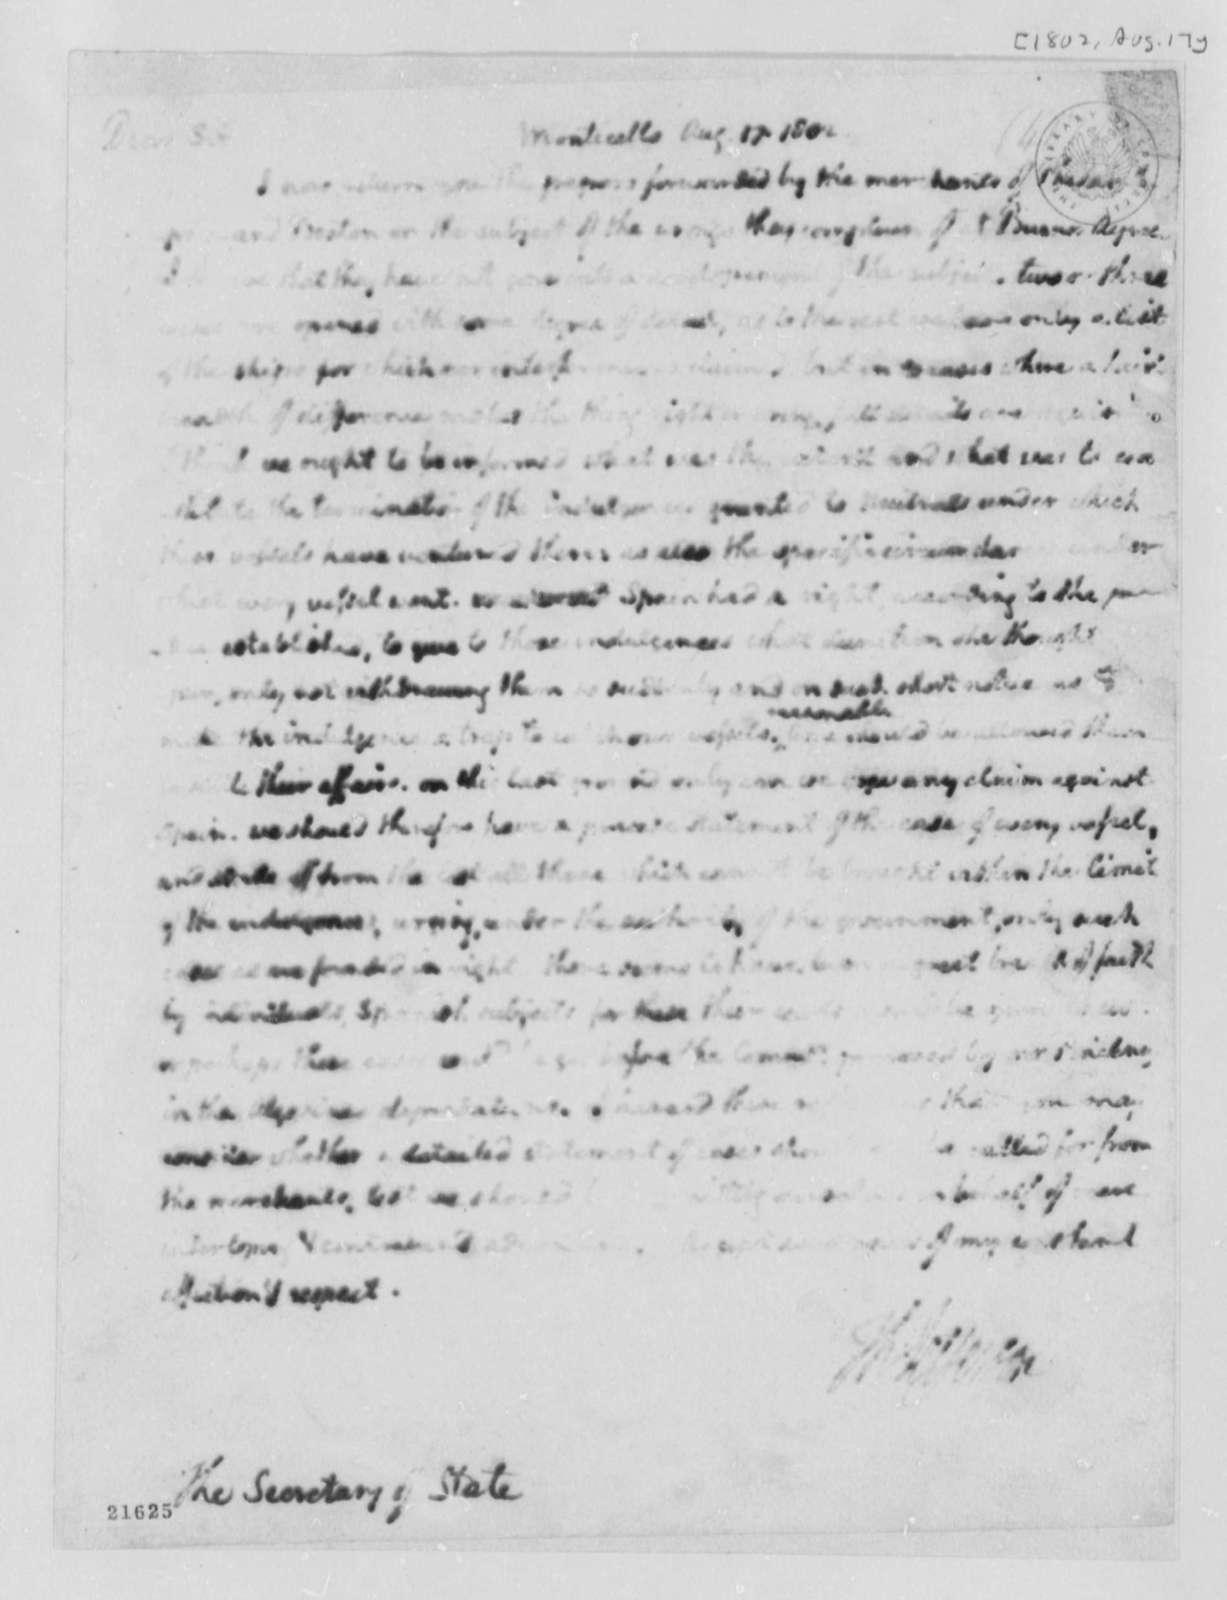 Thomas Jefferson to James Madison, August 17, 1802